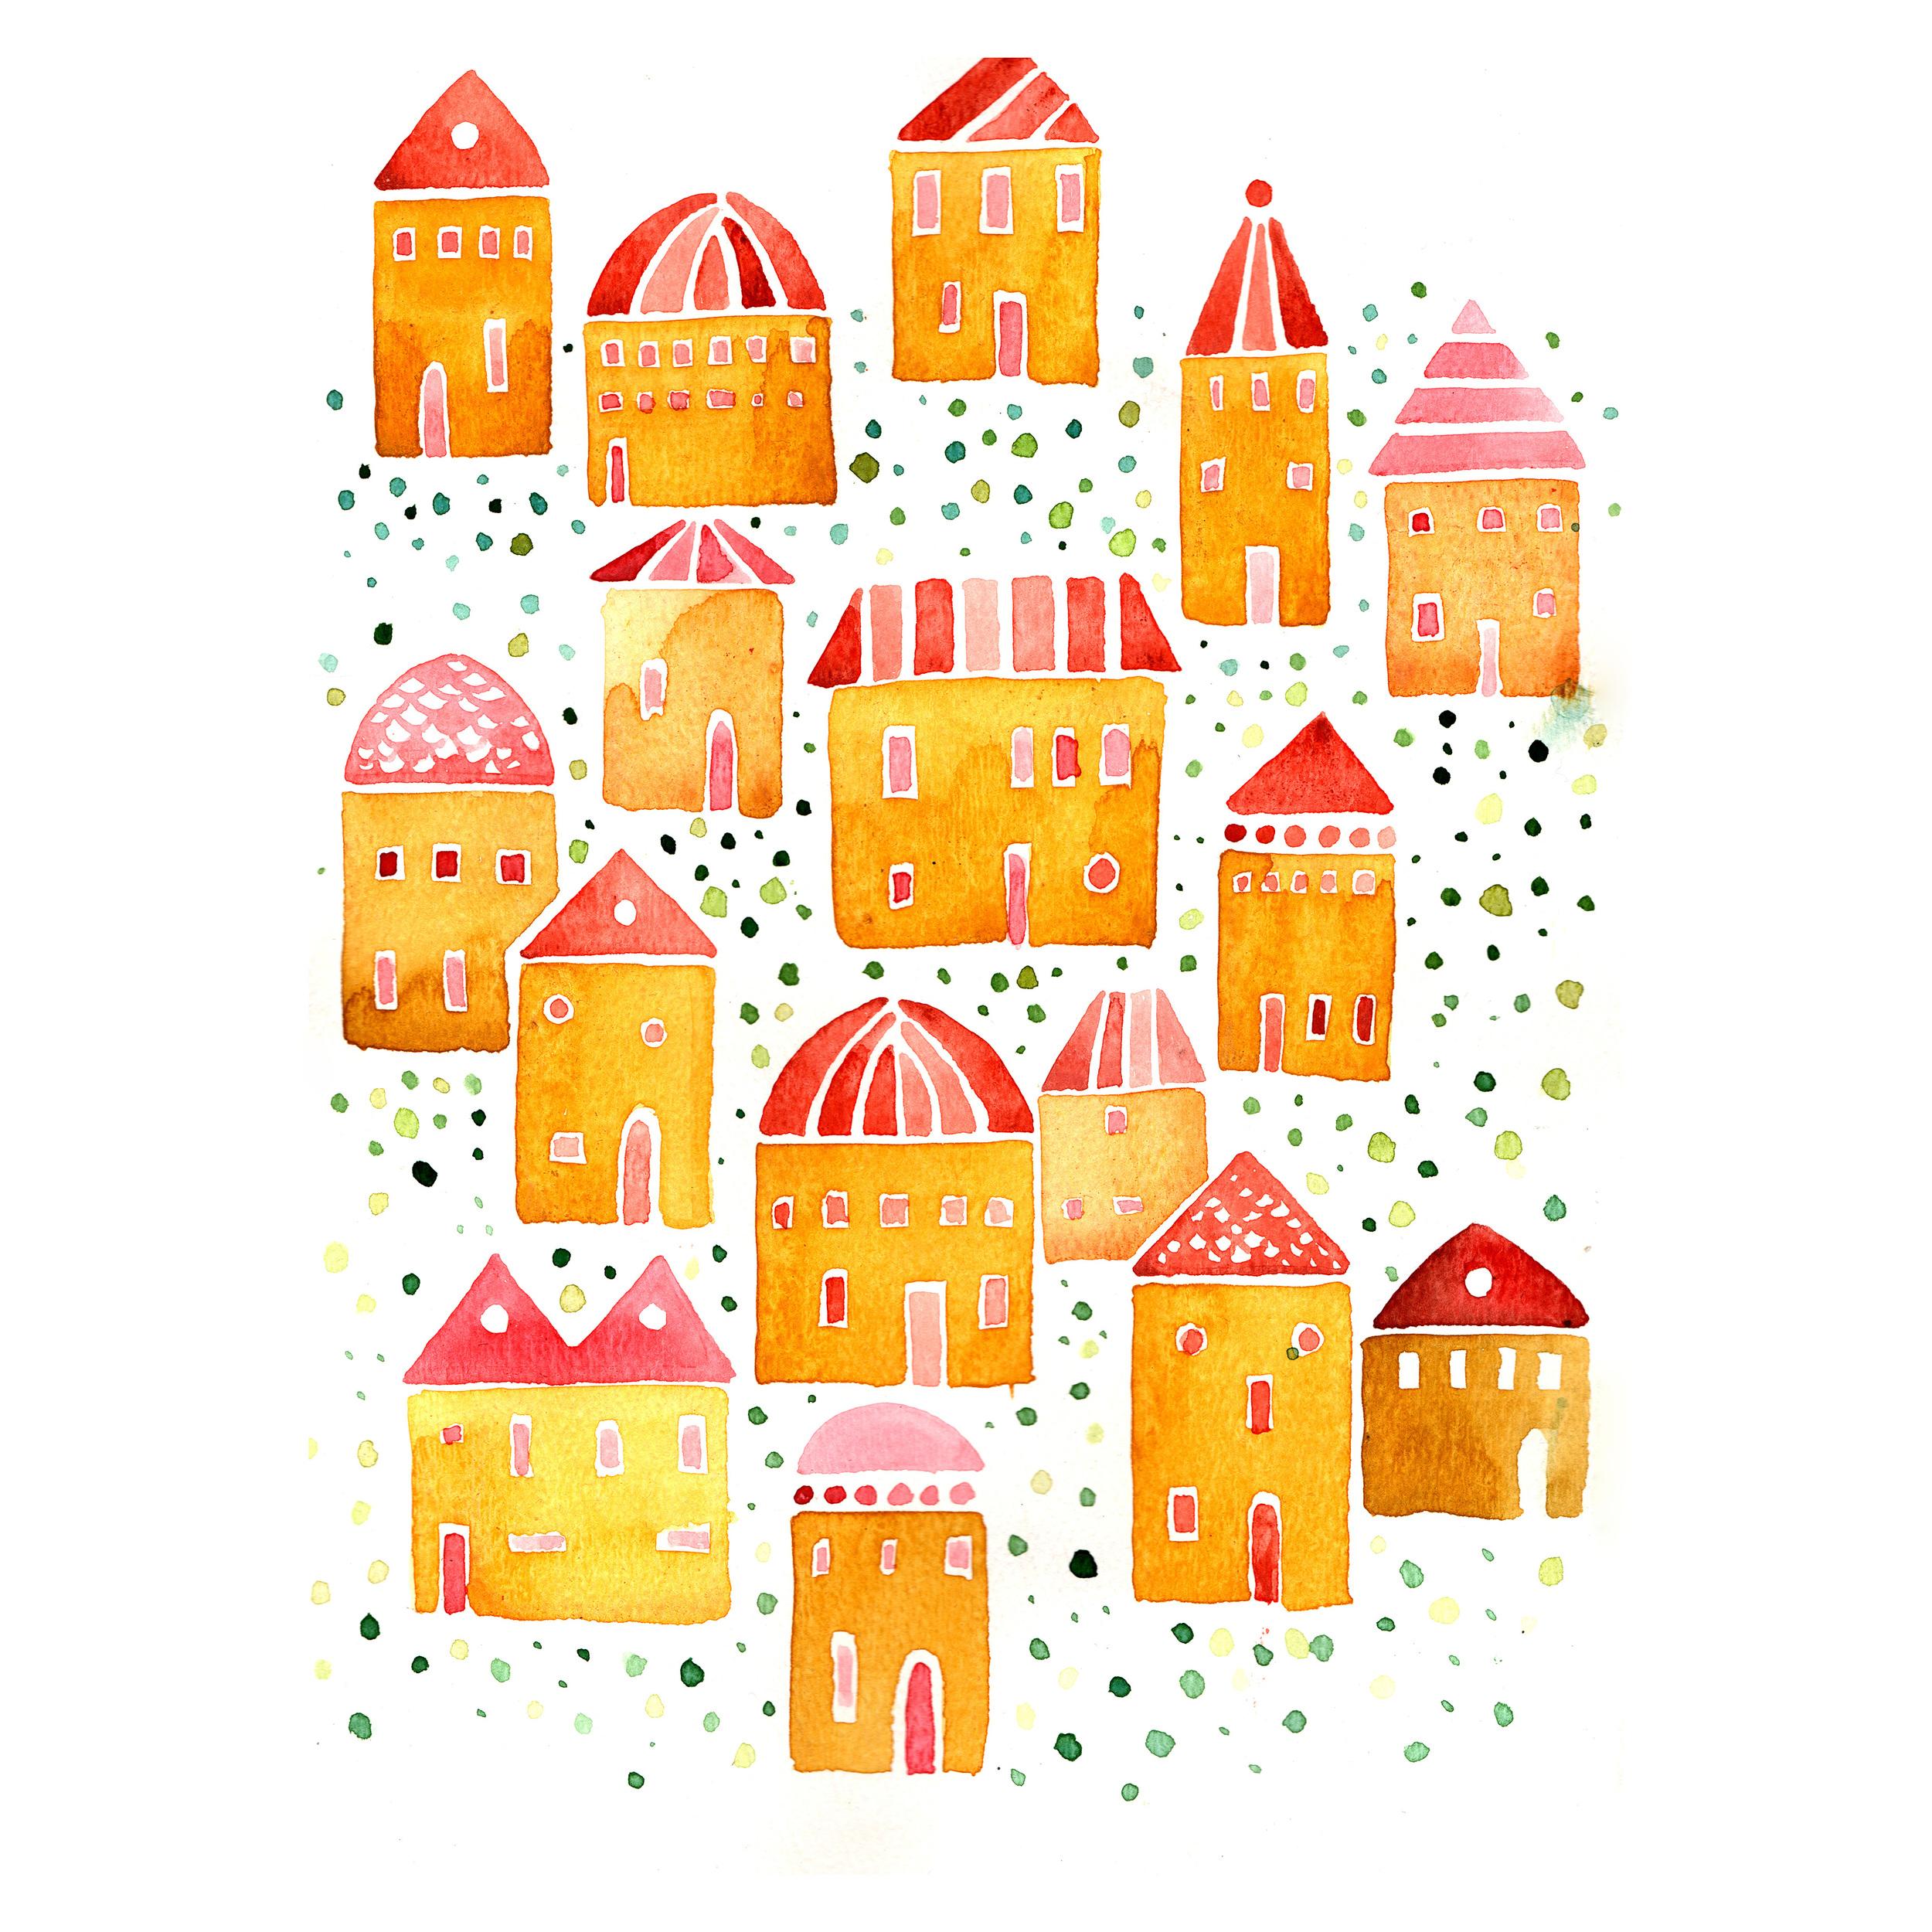 houses_yellow_small.jpg